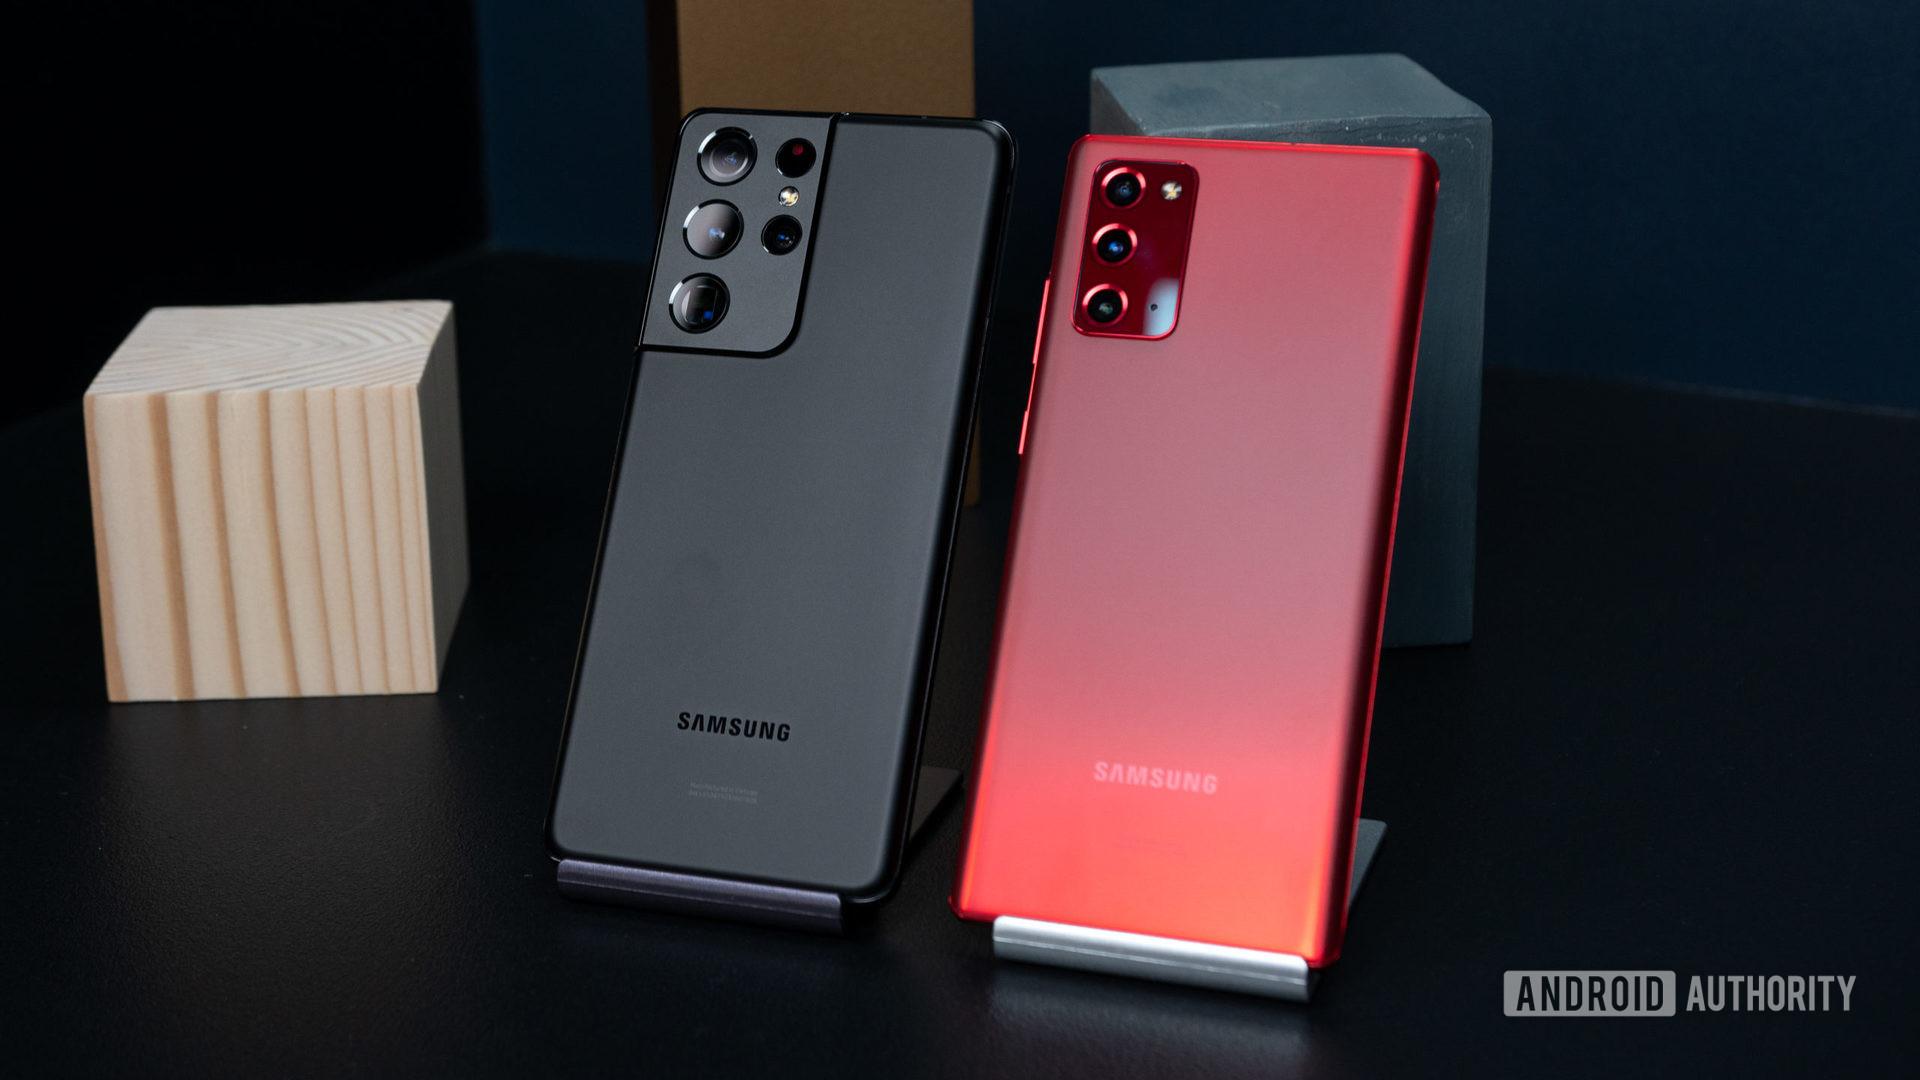 Samsung Galaxy S21 Ultra vs Samsung Galaxy Note 20 3